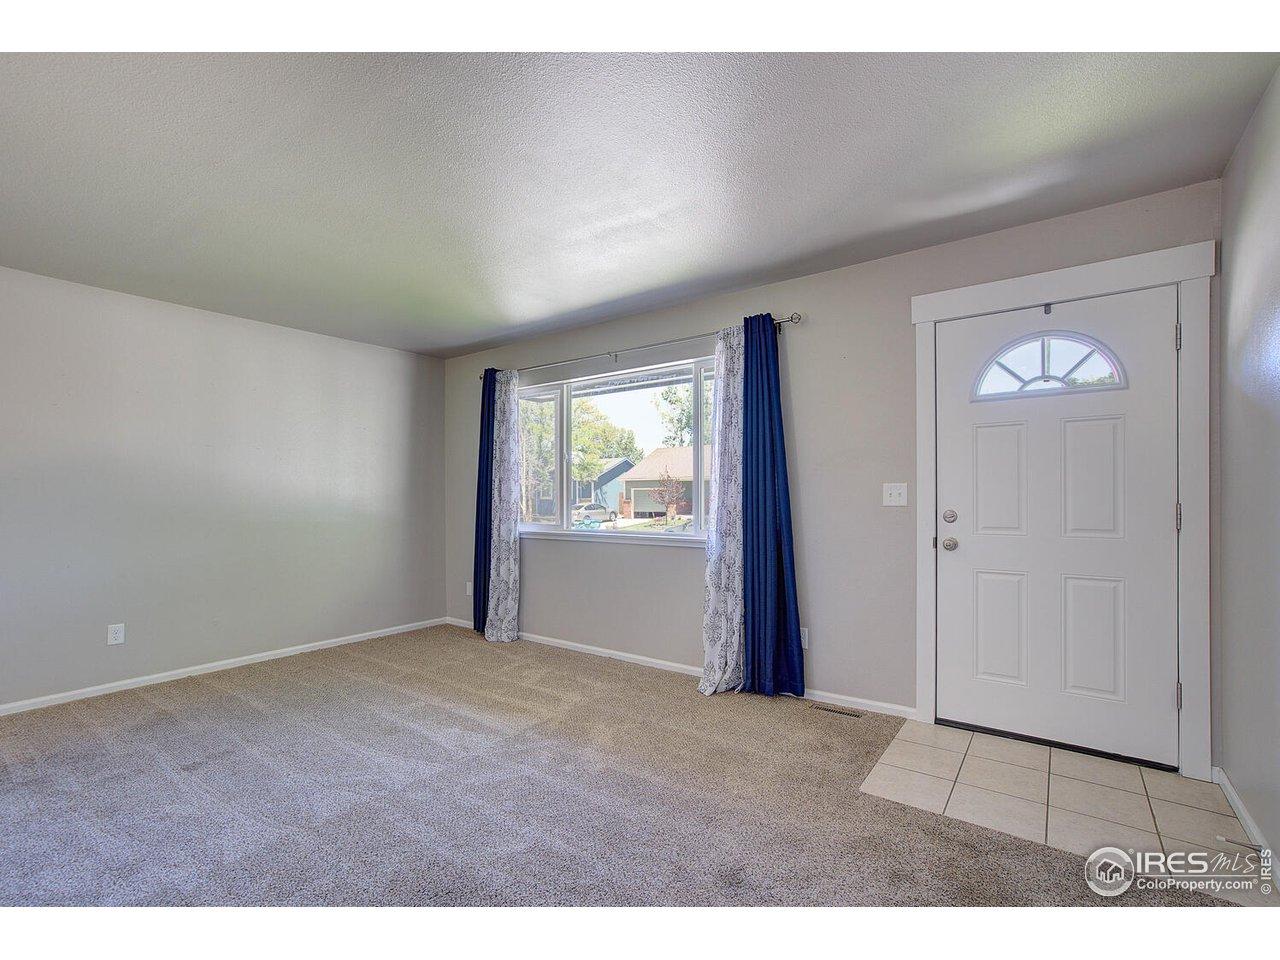 17 x 12 Living room